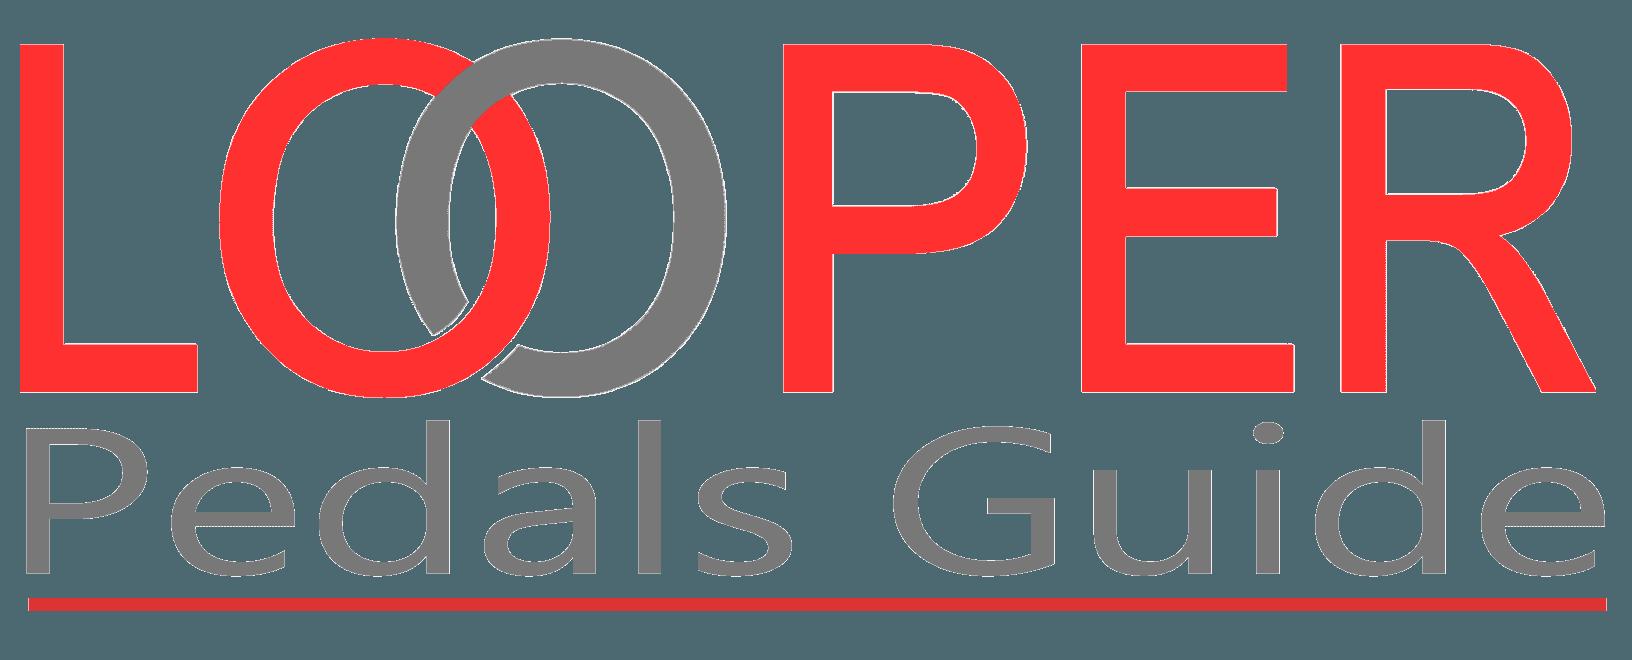 5 Best Looper Pedal Reviews